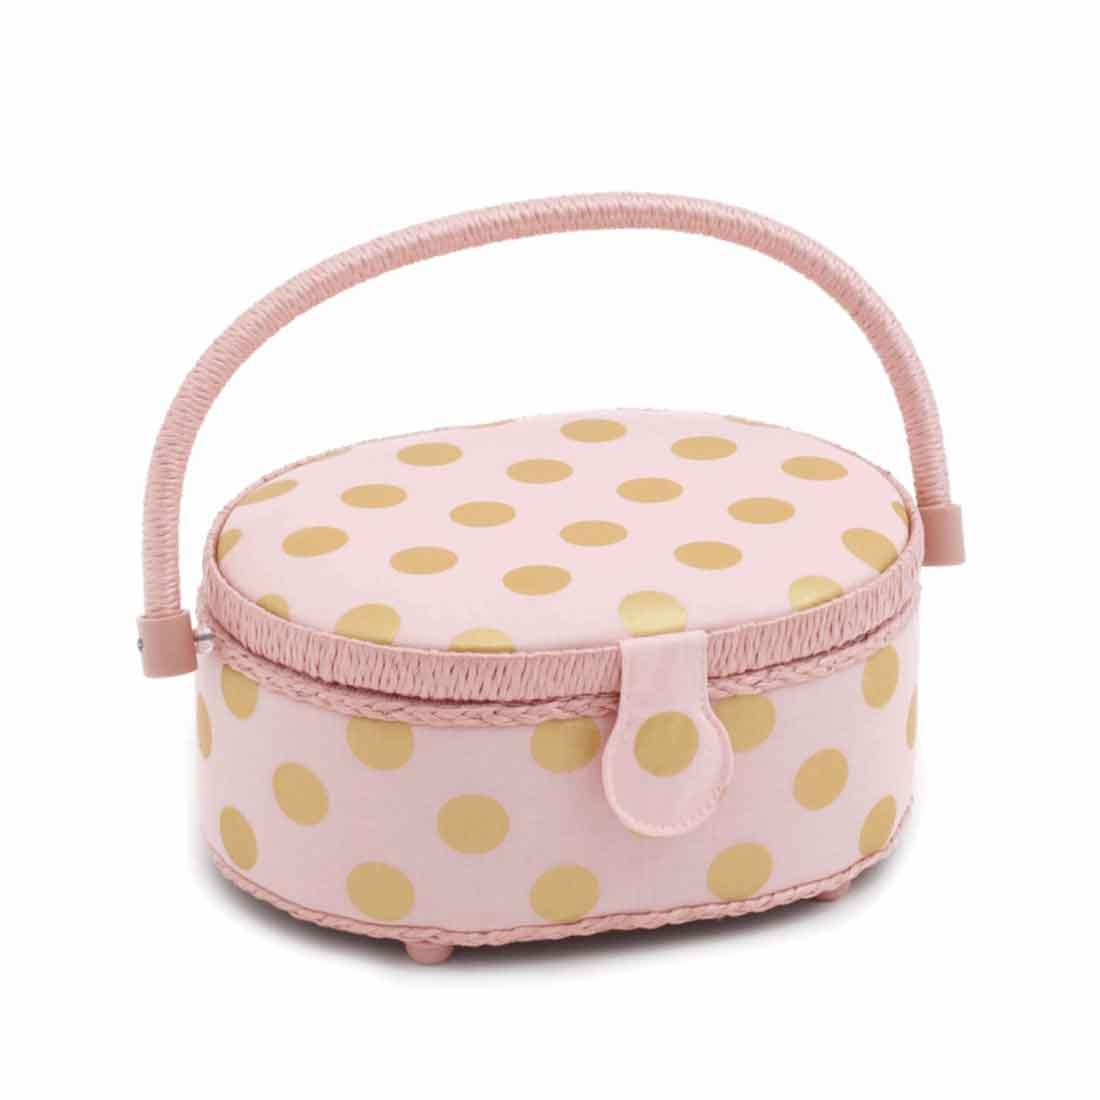 Oval Blush Dot Sewing Basket